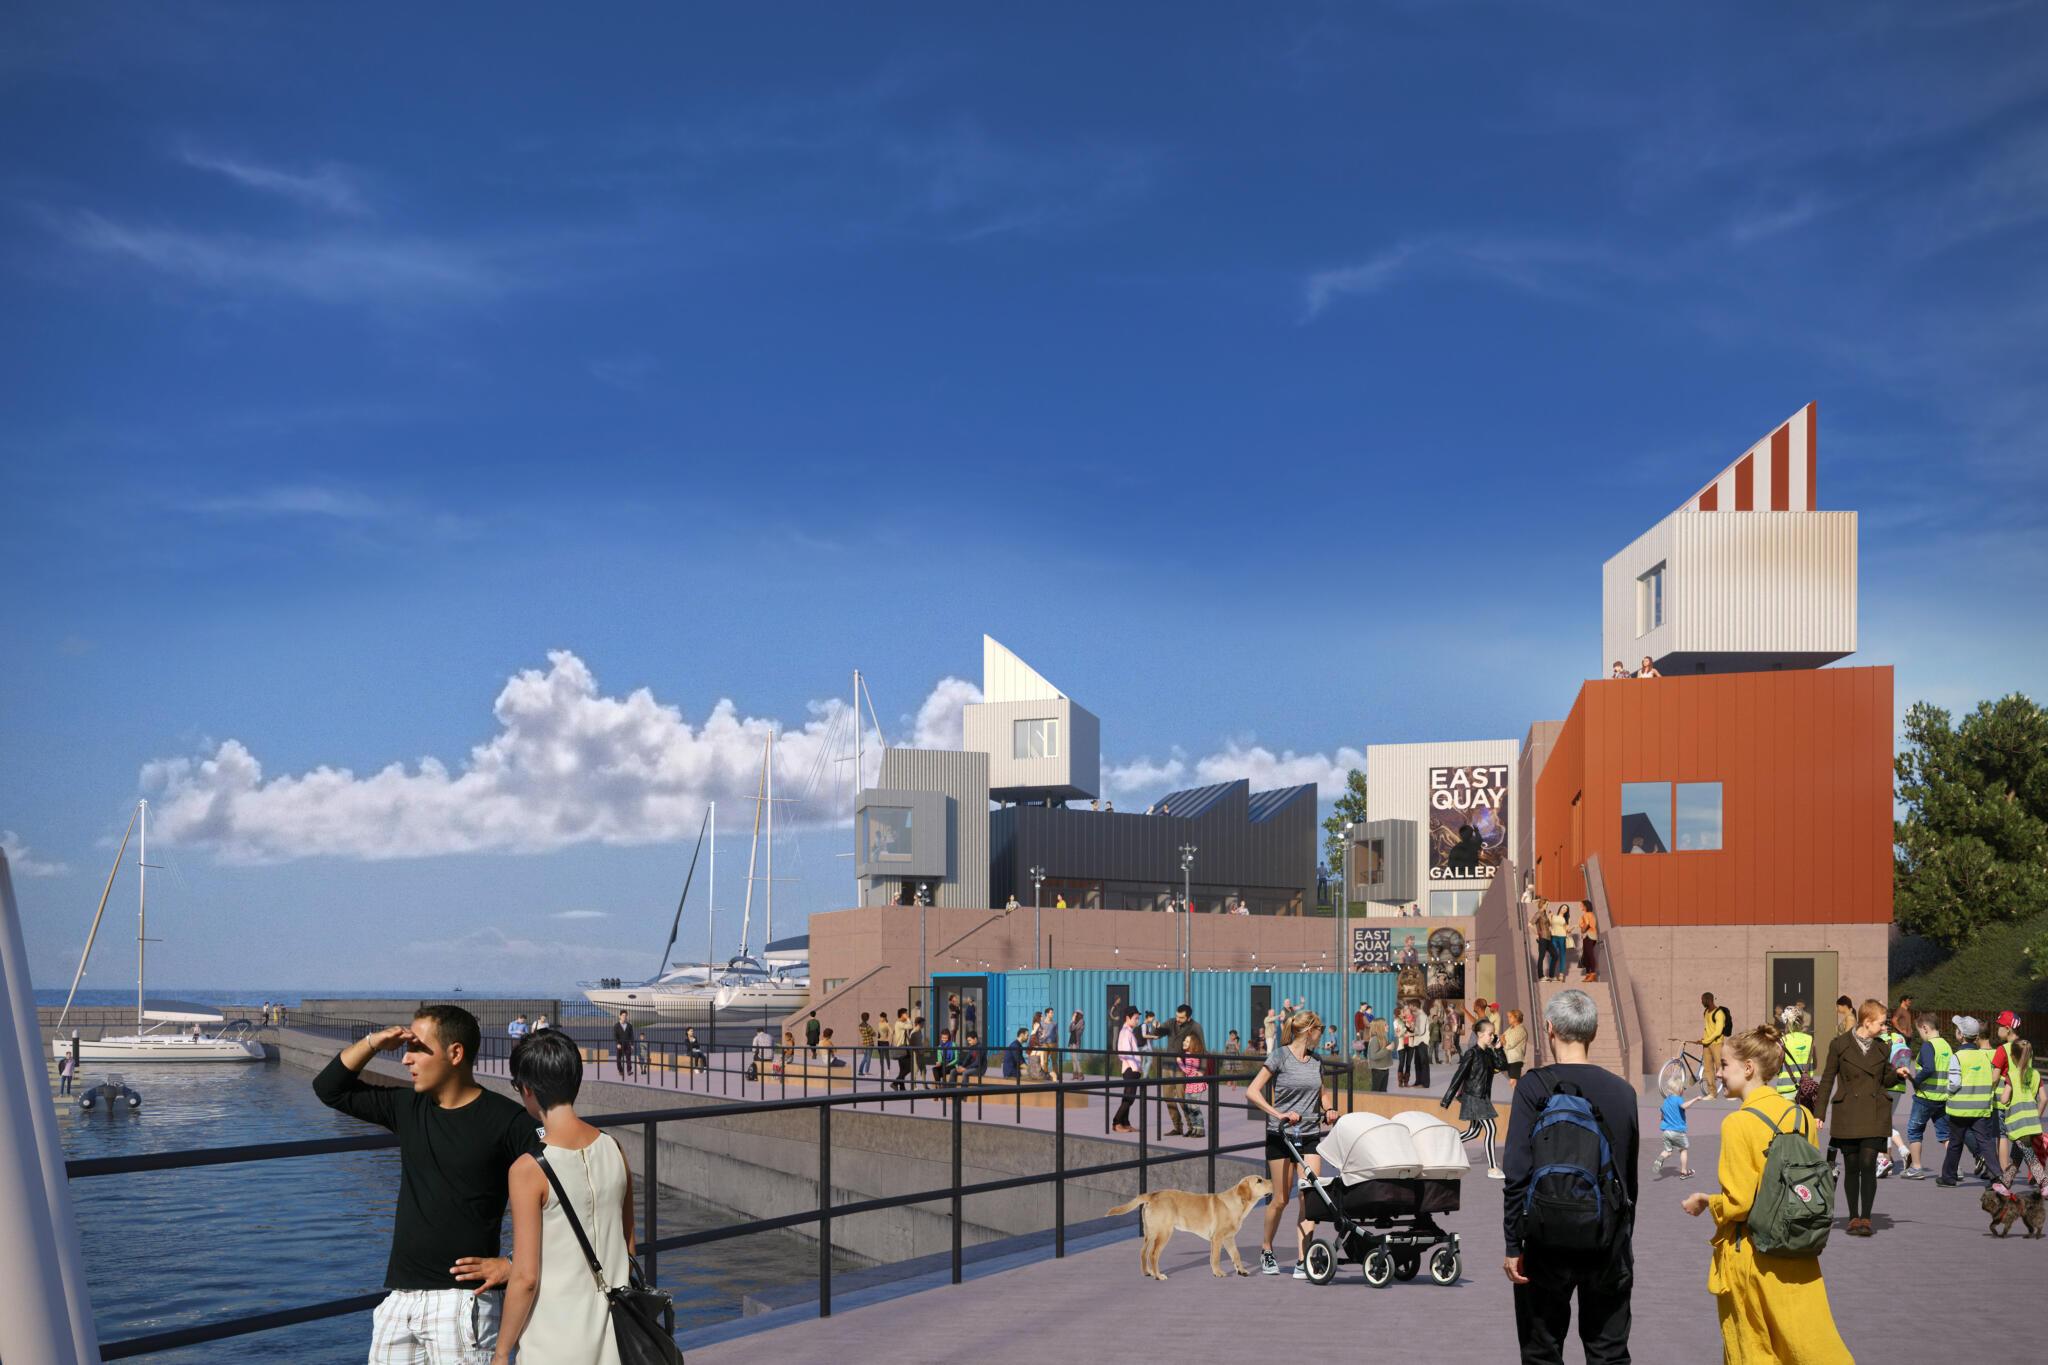 Watchet's East Quay Cultural and Enterprise Development